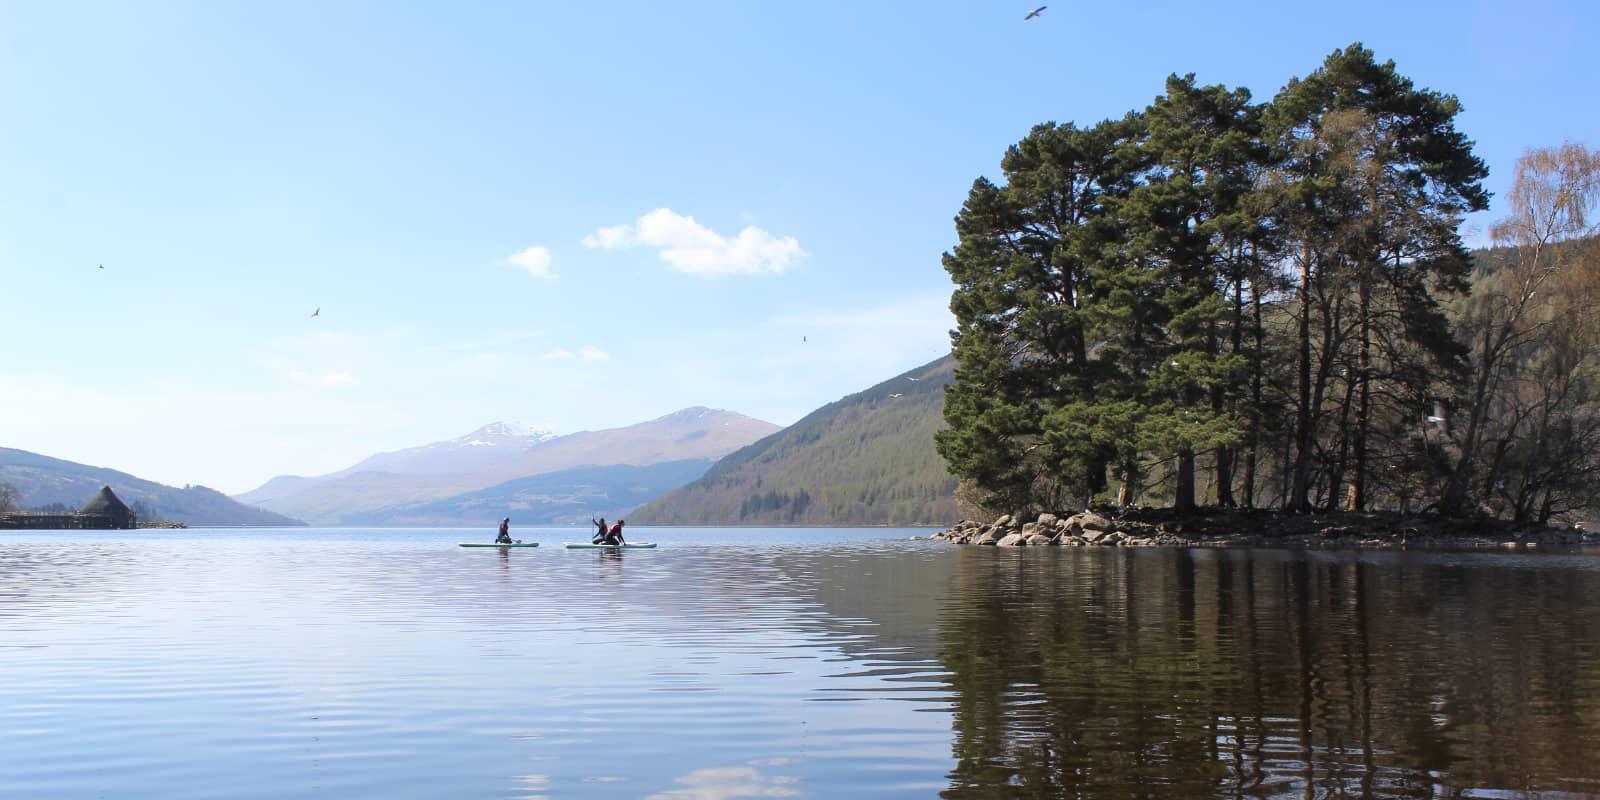 standup-paddleboarding-in-scotland-splash-3